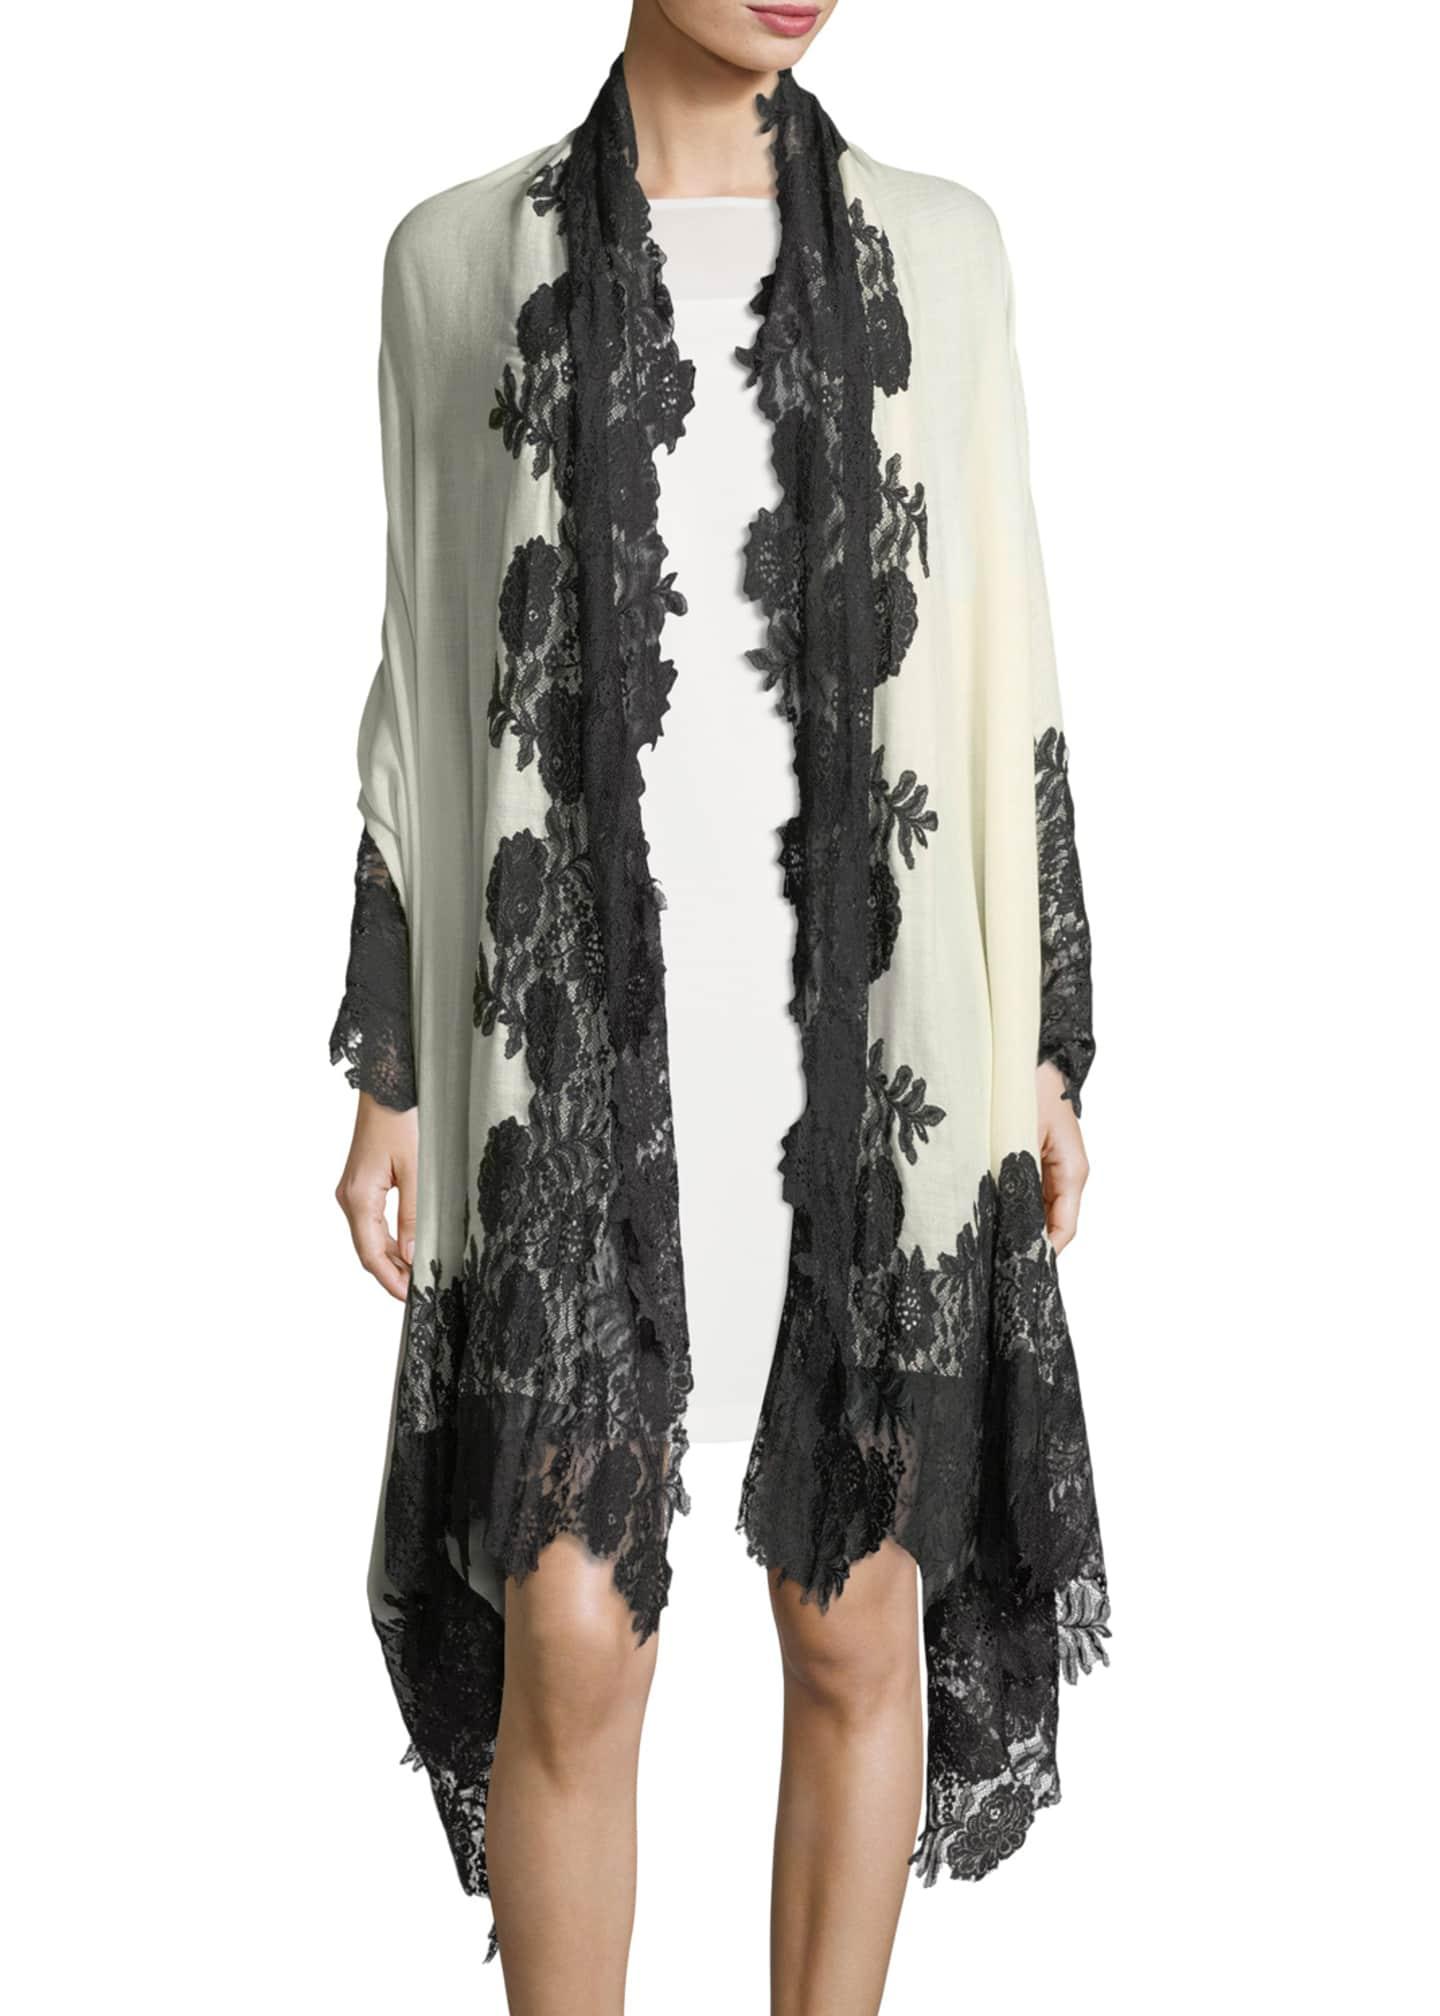 Bindya Accessories Cashmere Evening Stole Wrap w/ Lace